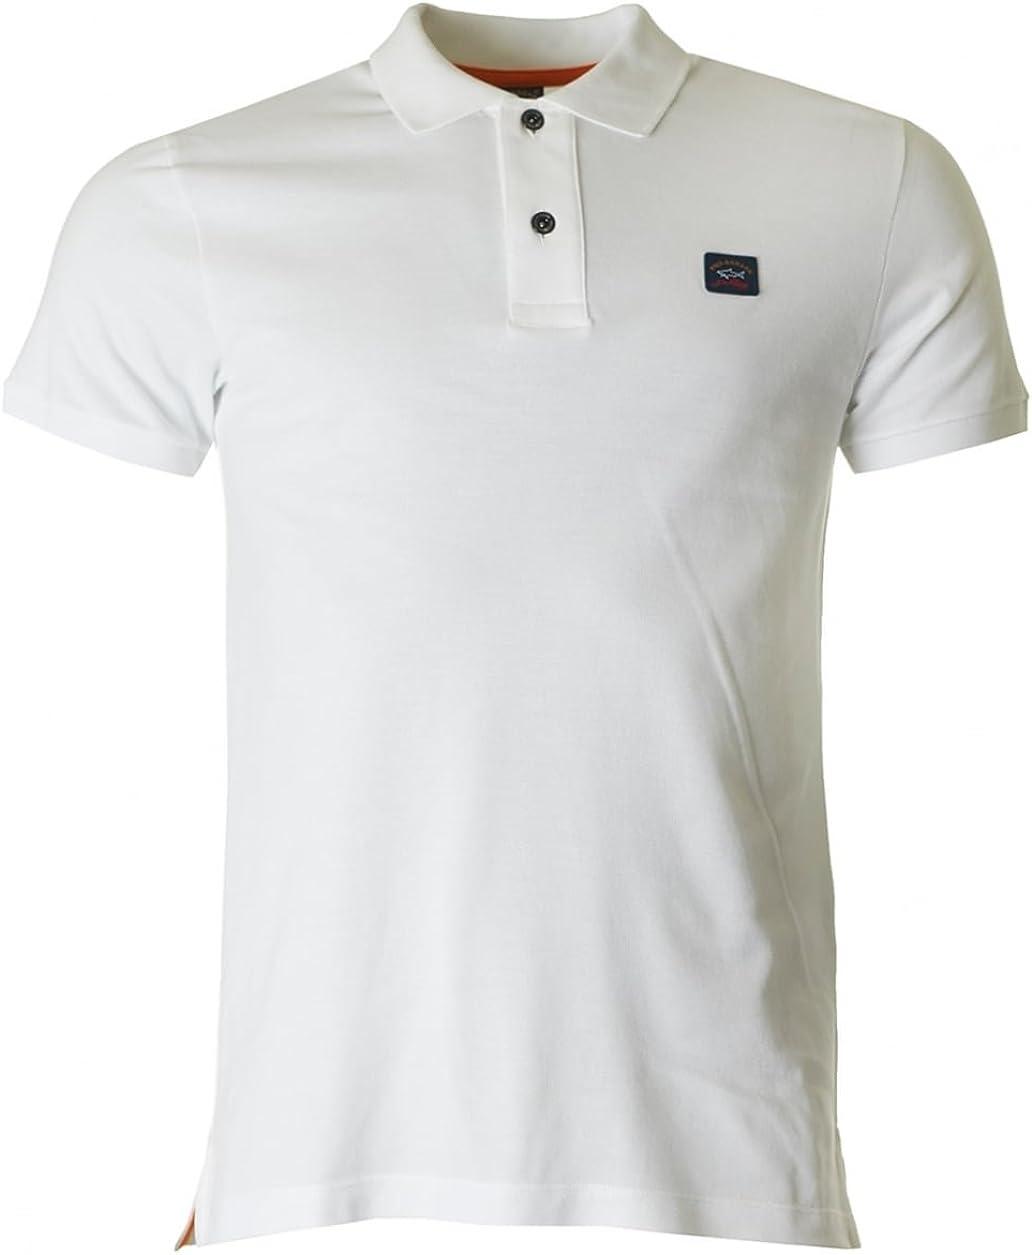 Paul & Shark Camisa Polo de manga corta blanco XX Large: Amazon.es: Ropa y accesorios